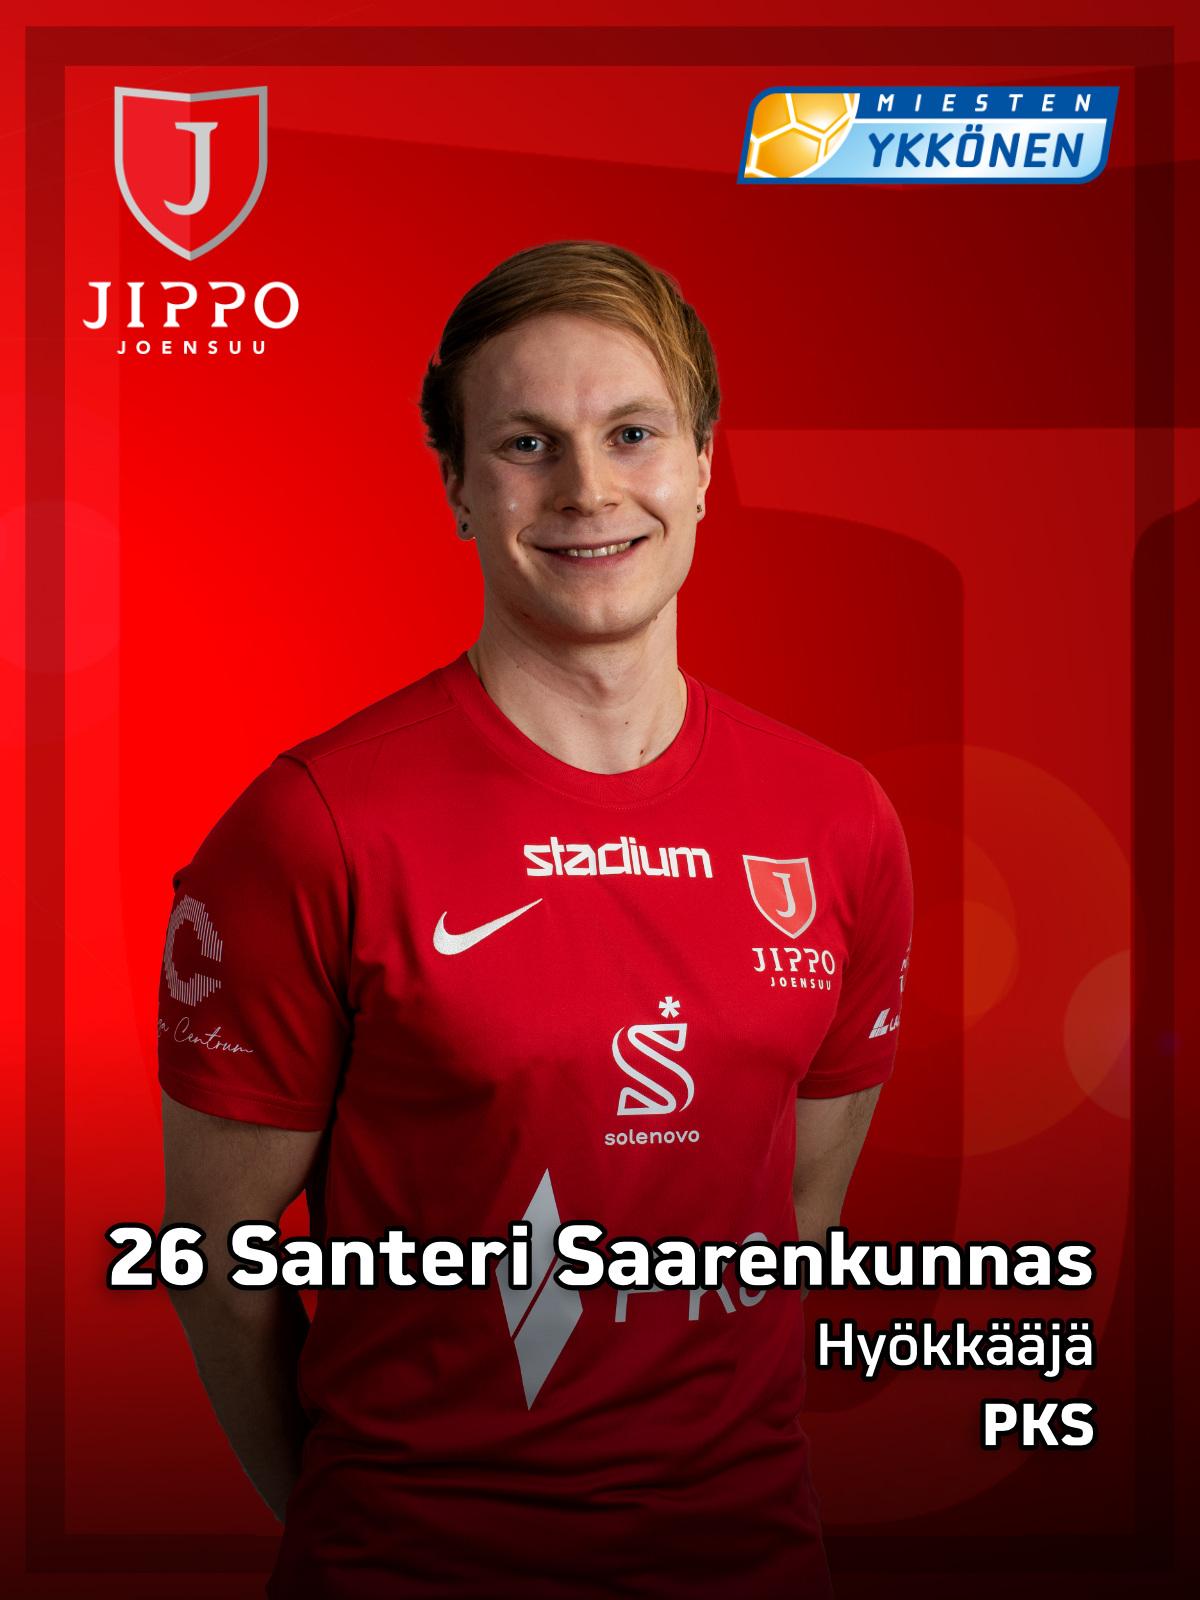 26 Santeri Saarenkunnas